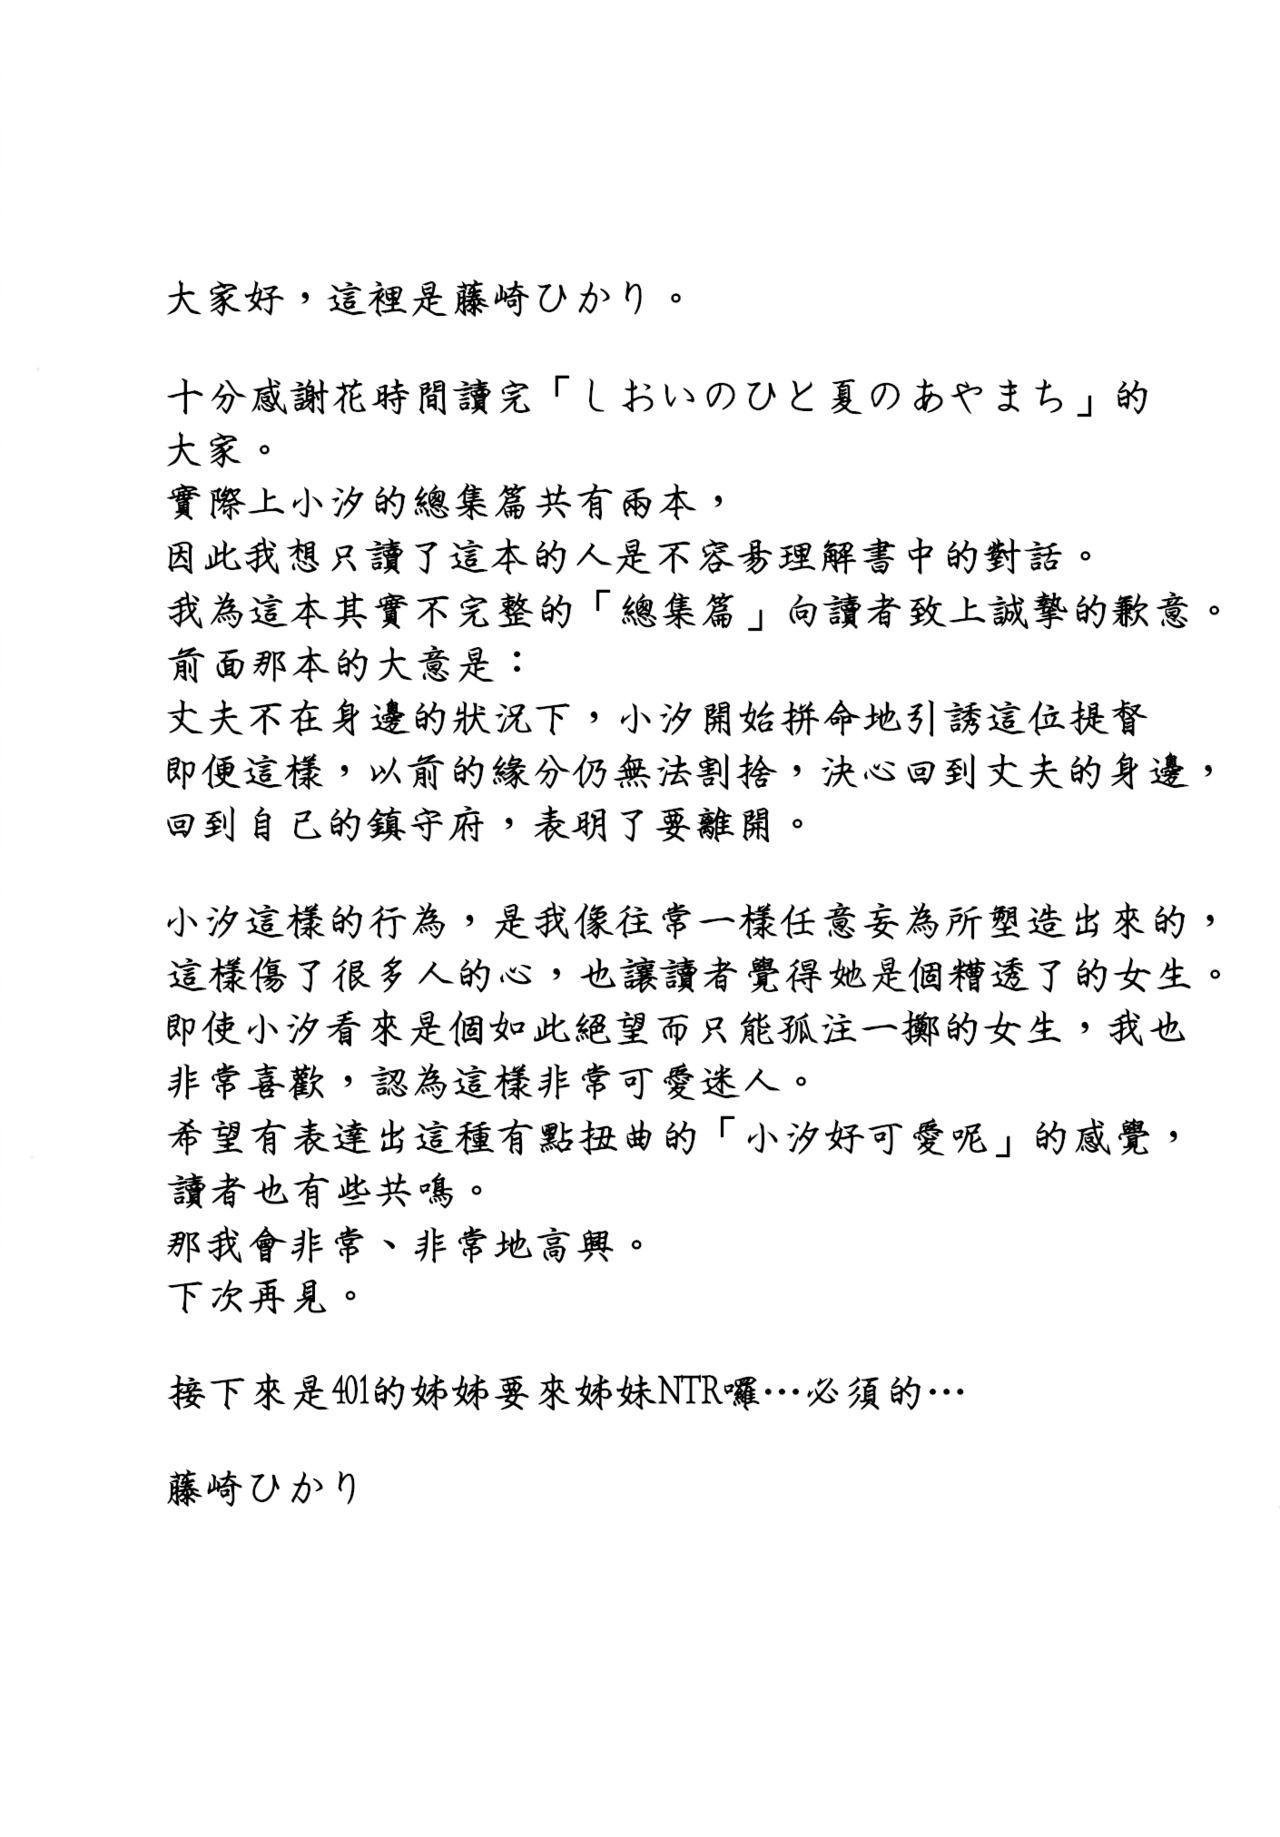 [French letter (Fujisaki Hikari)] Hitonatsu no Ayamachi -I-401 Soushuuhen- (Kantai Collection -KanColle-) [Chinese] [Digital] 87